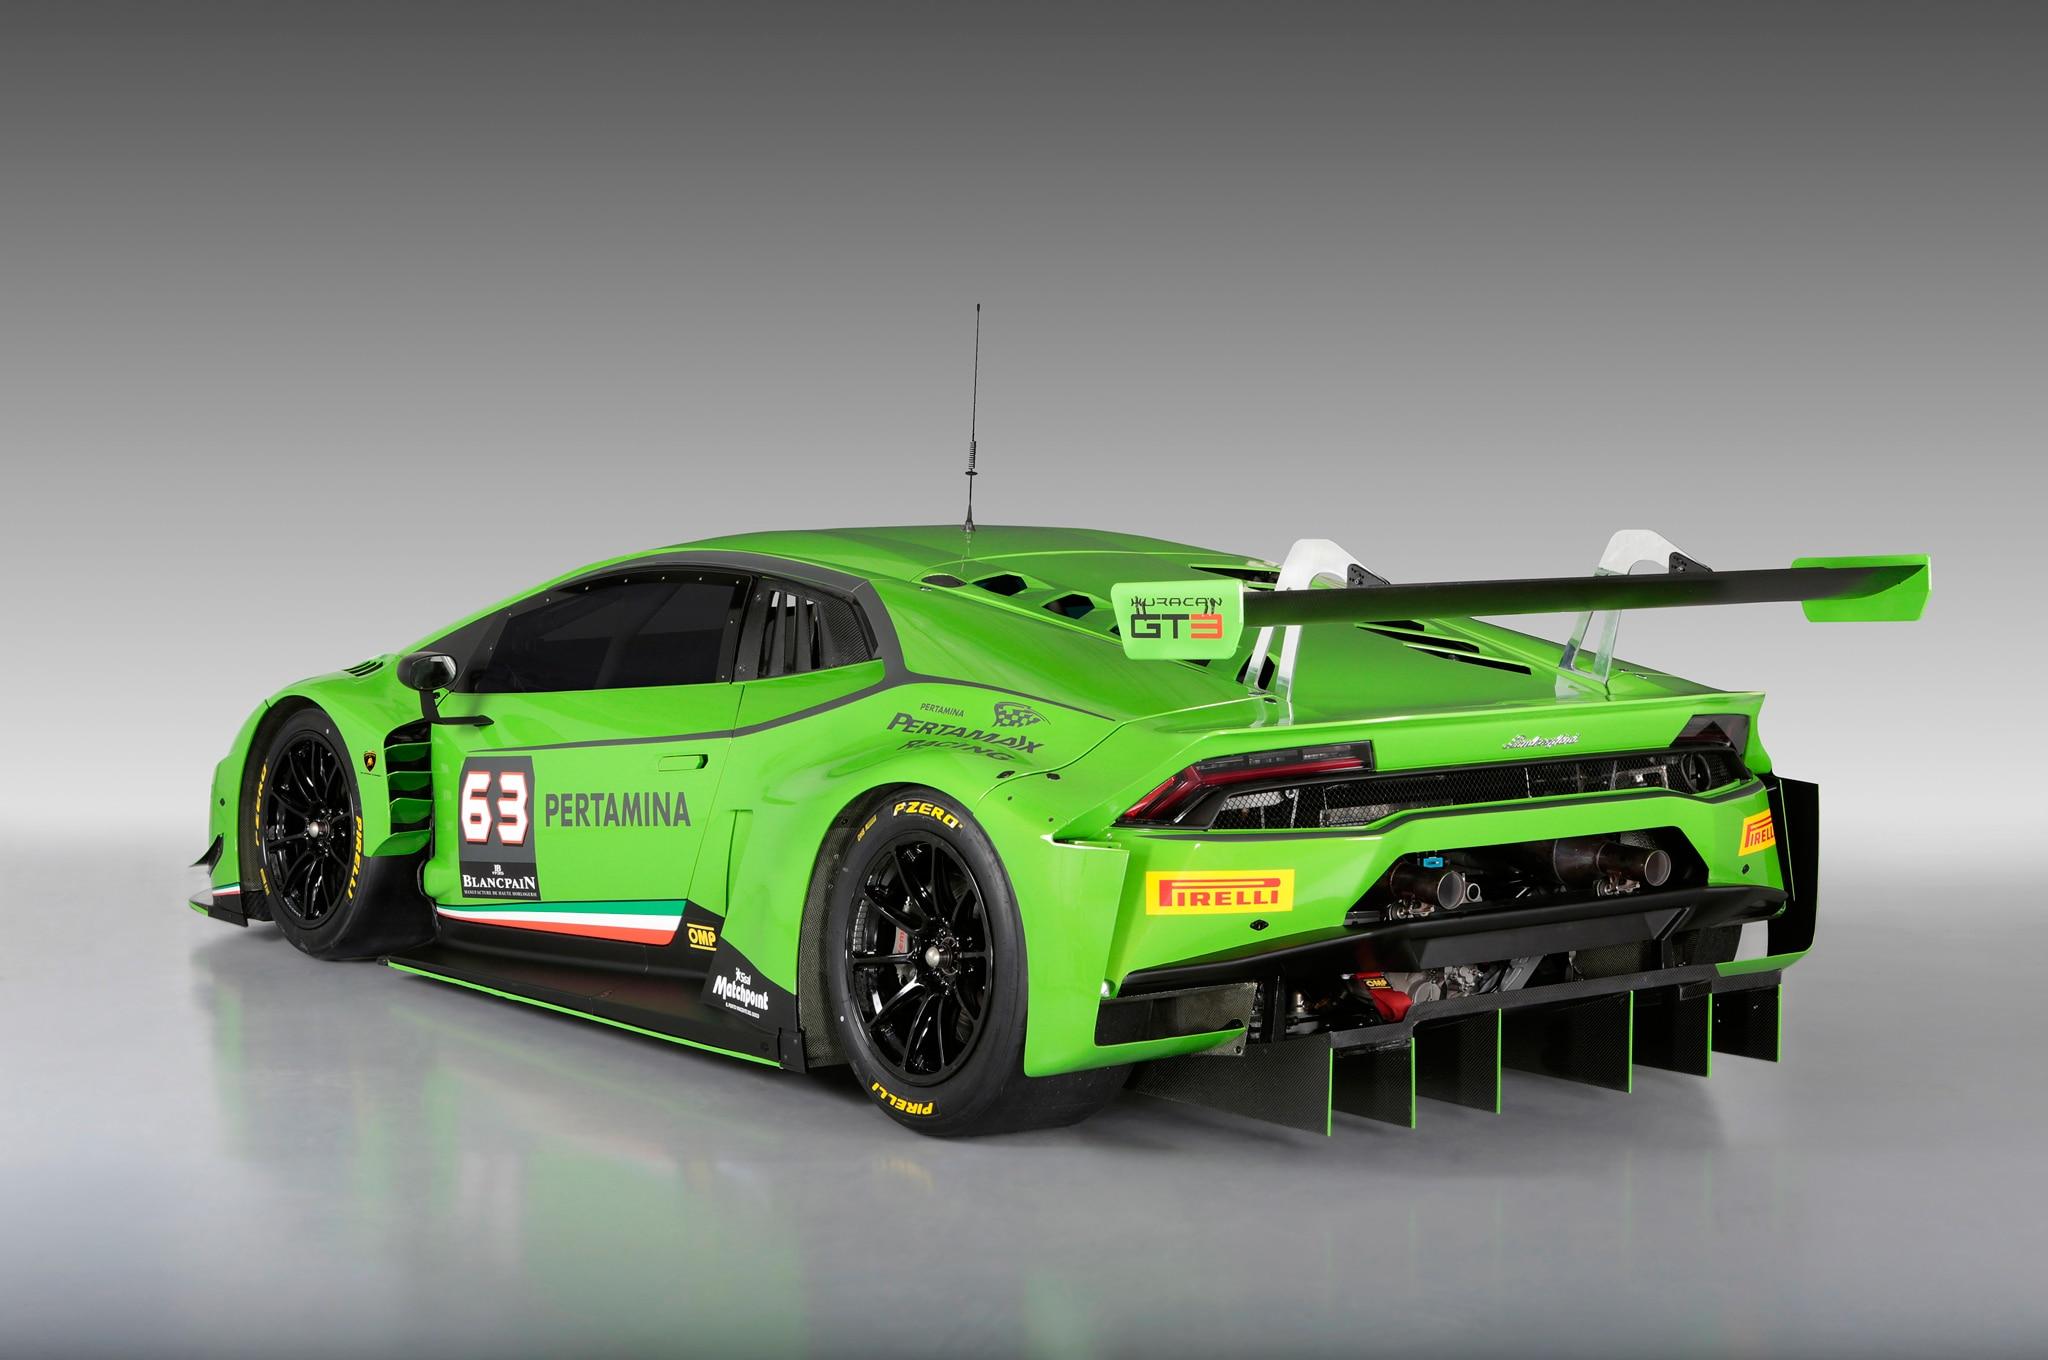 lamborghini huracan gt3 race car revealed. Black Bedroom Furniture Sets. Home Design Ideas